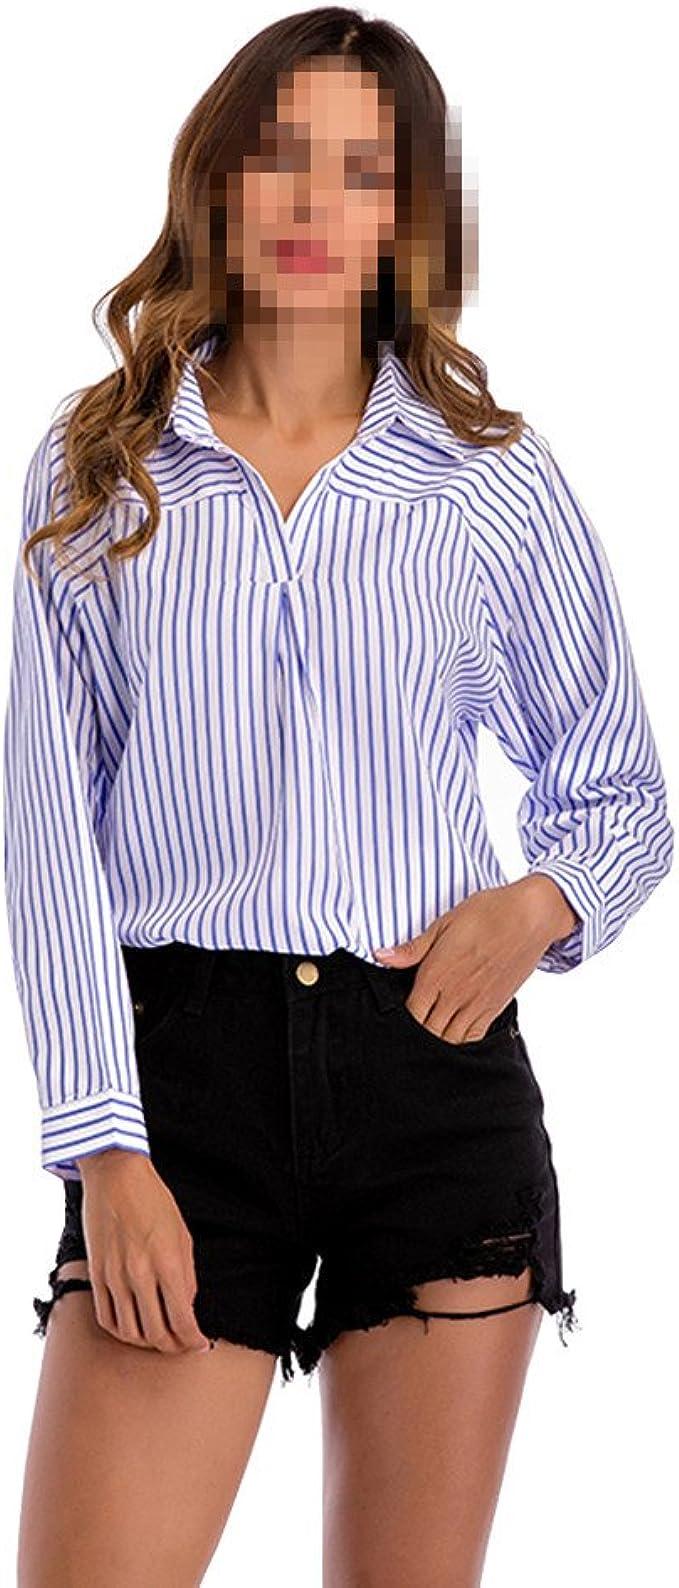 OULII Camisa a Cuadros Sueltos Clásicos de Mujer Camisas con ...